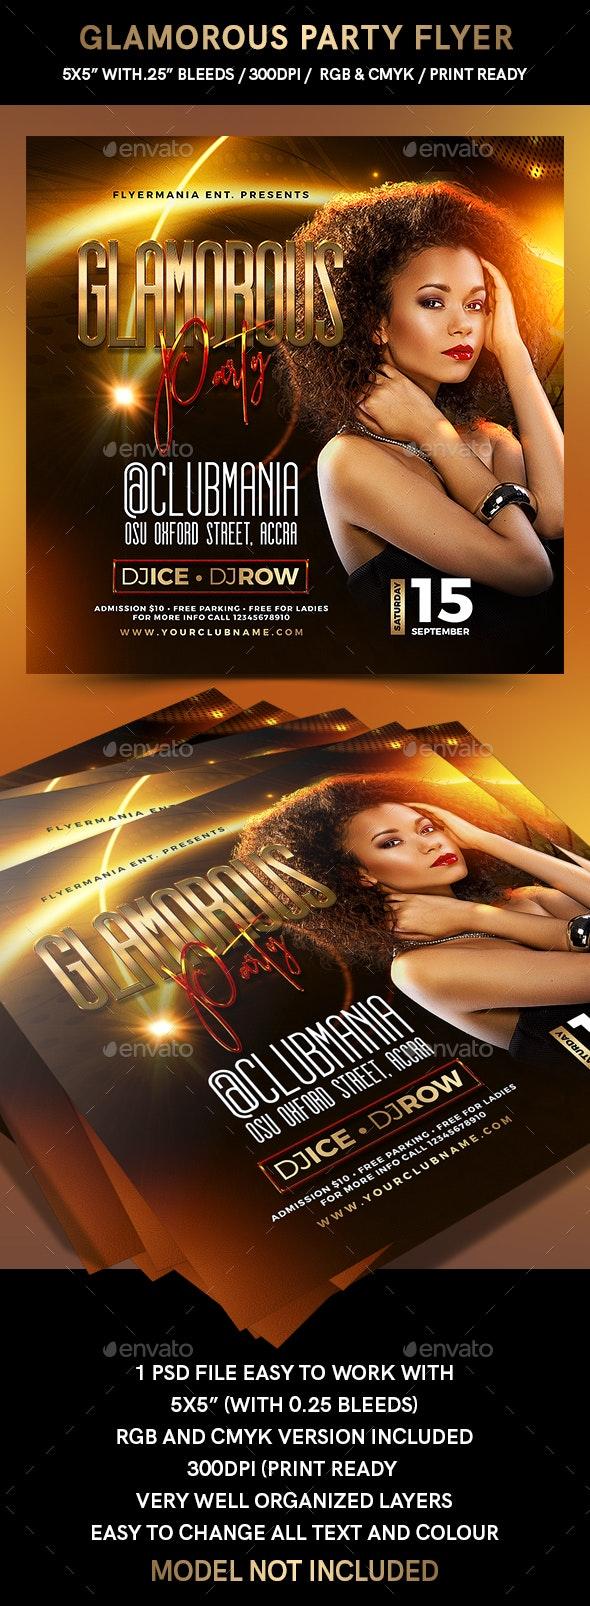 Glamorous Party Flyer - Flyers Print Templates